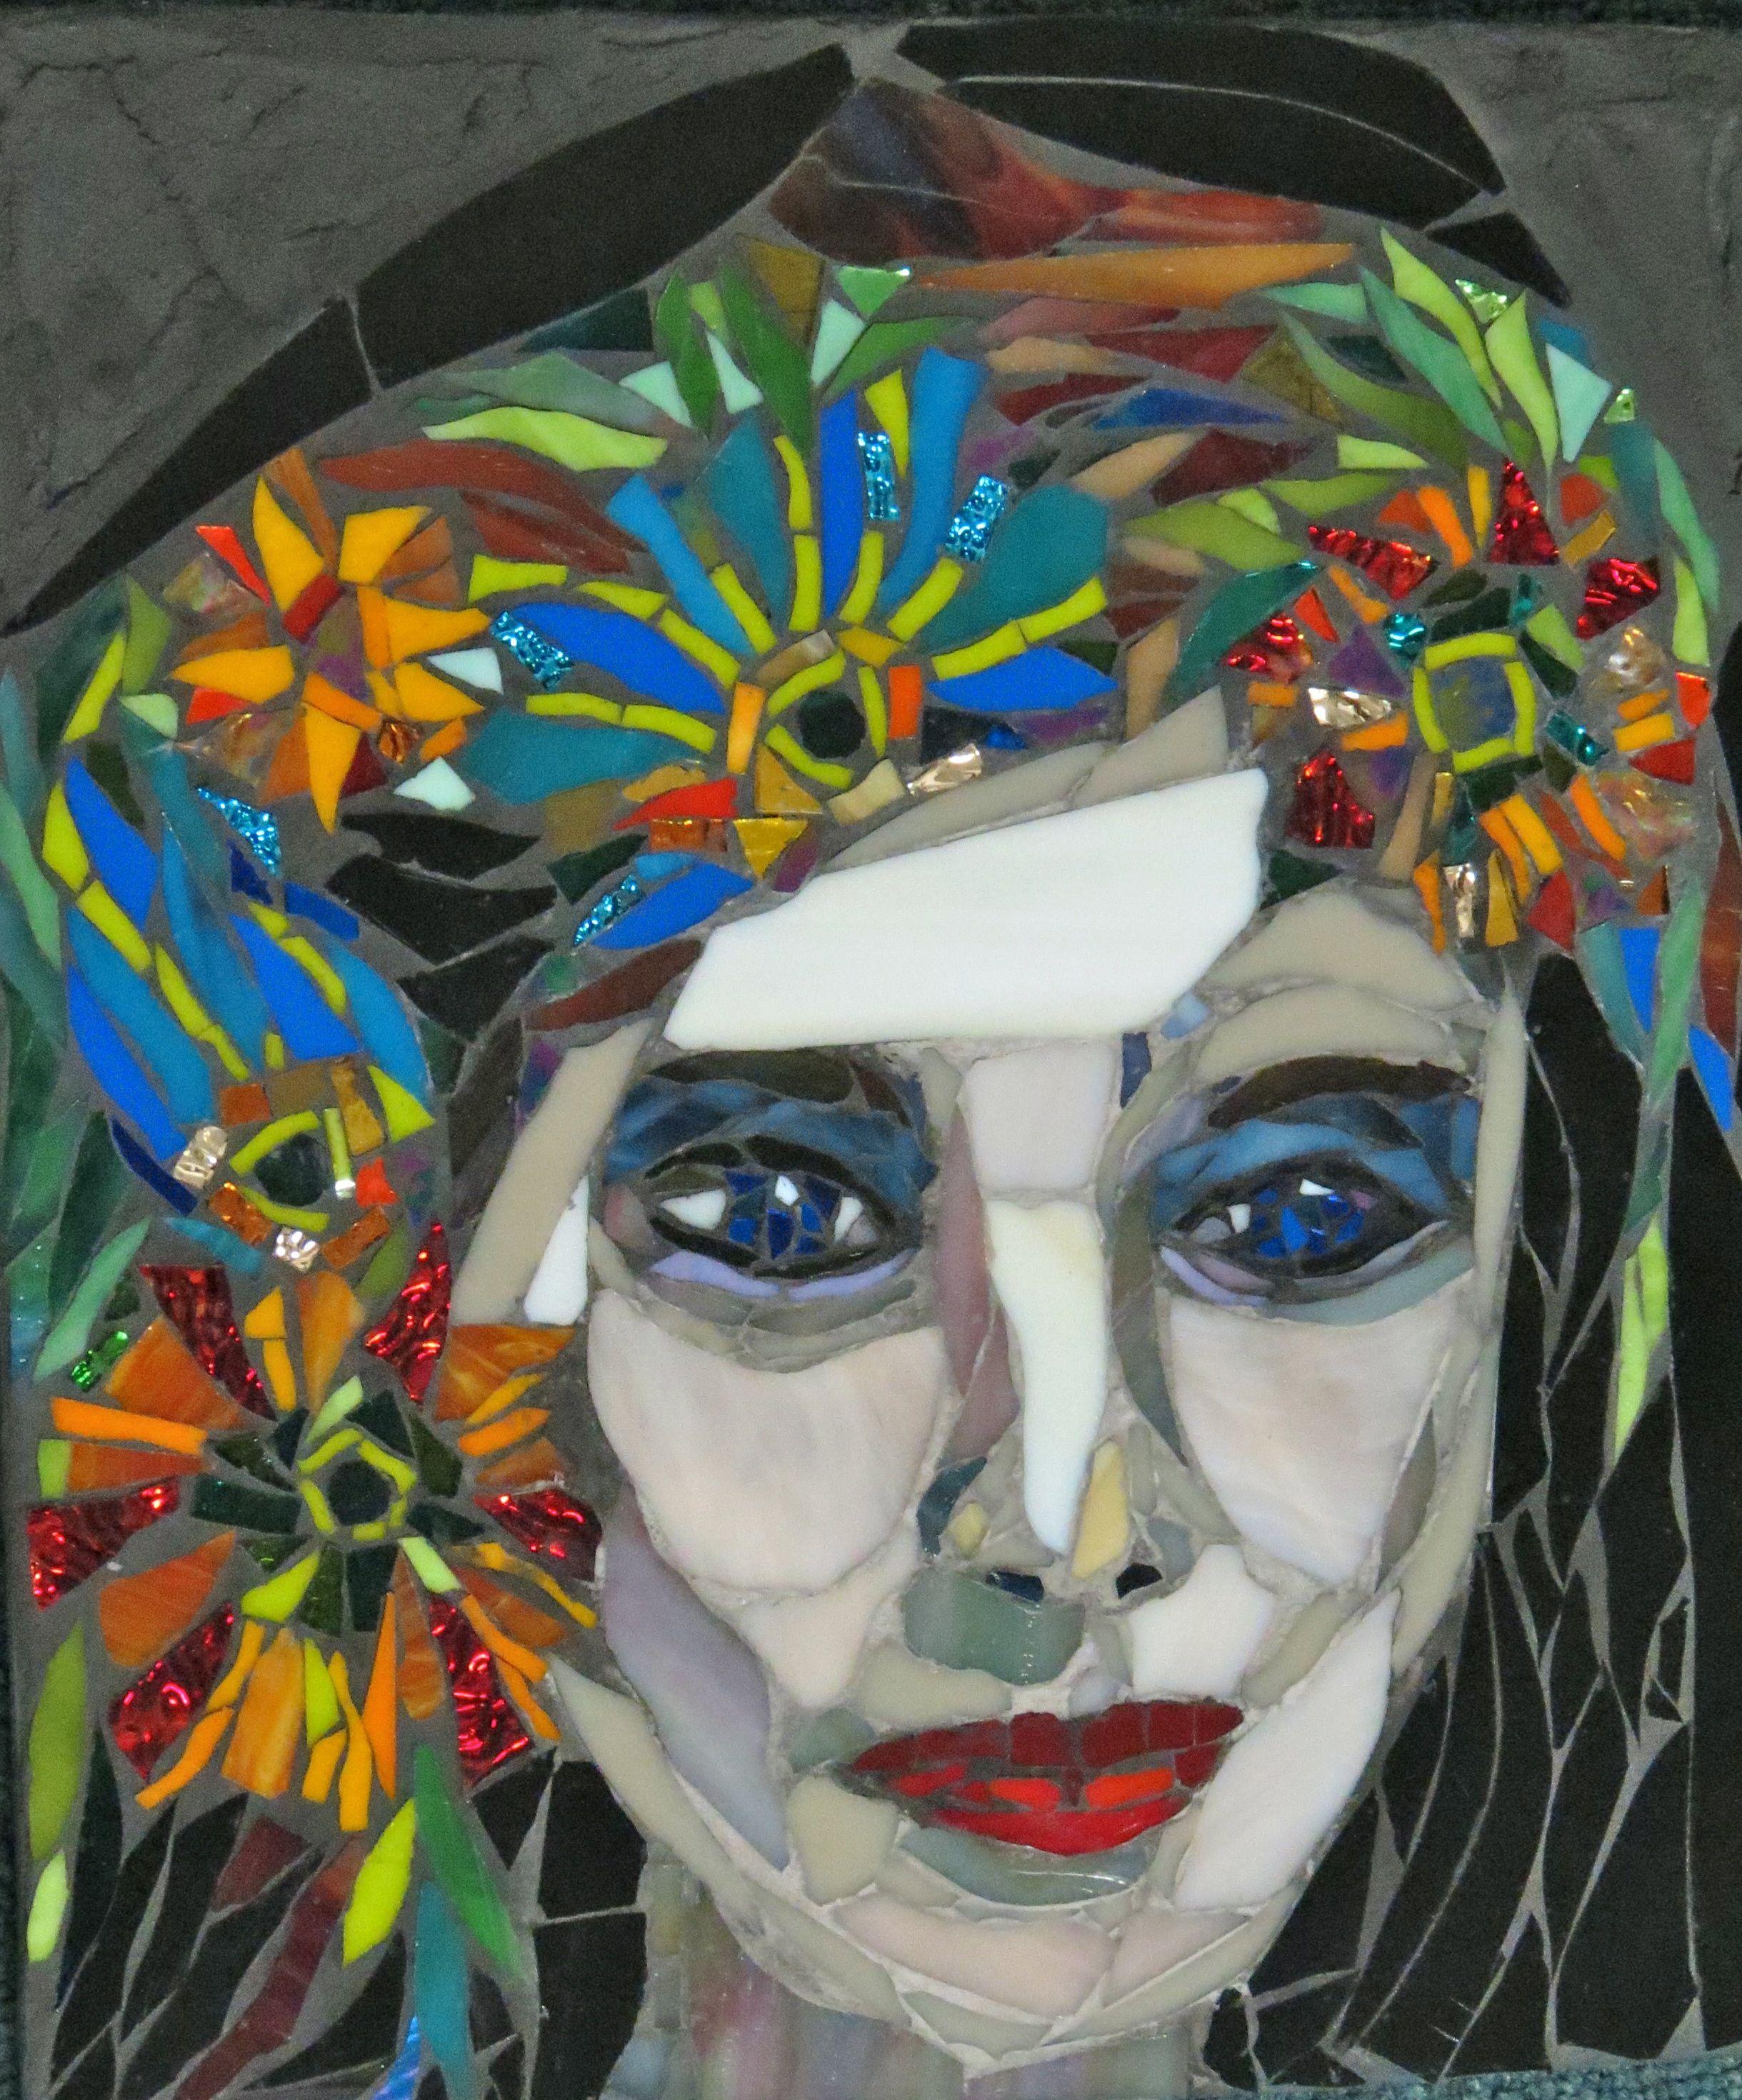 Mosaic Art By Kat Gottke Flower Girls Mosaic Portrait Mosaic Wall Art Mosaic Art